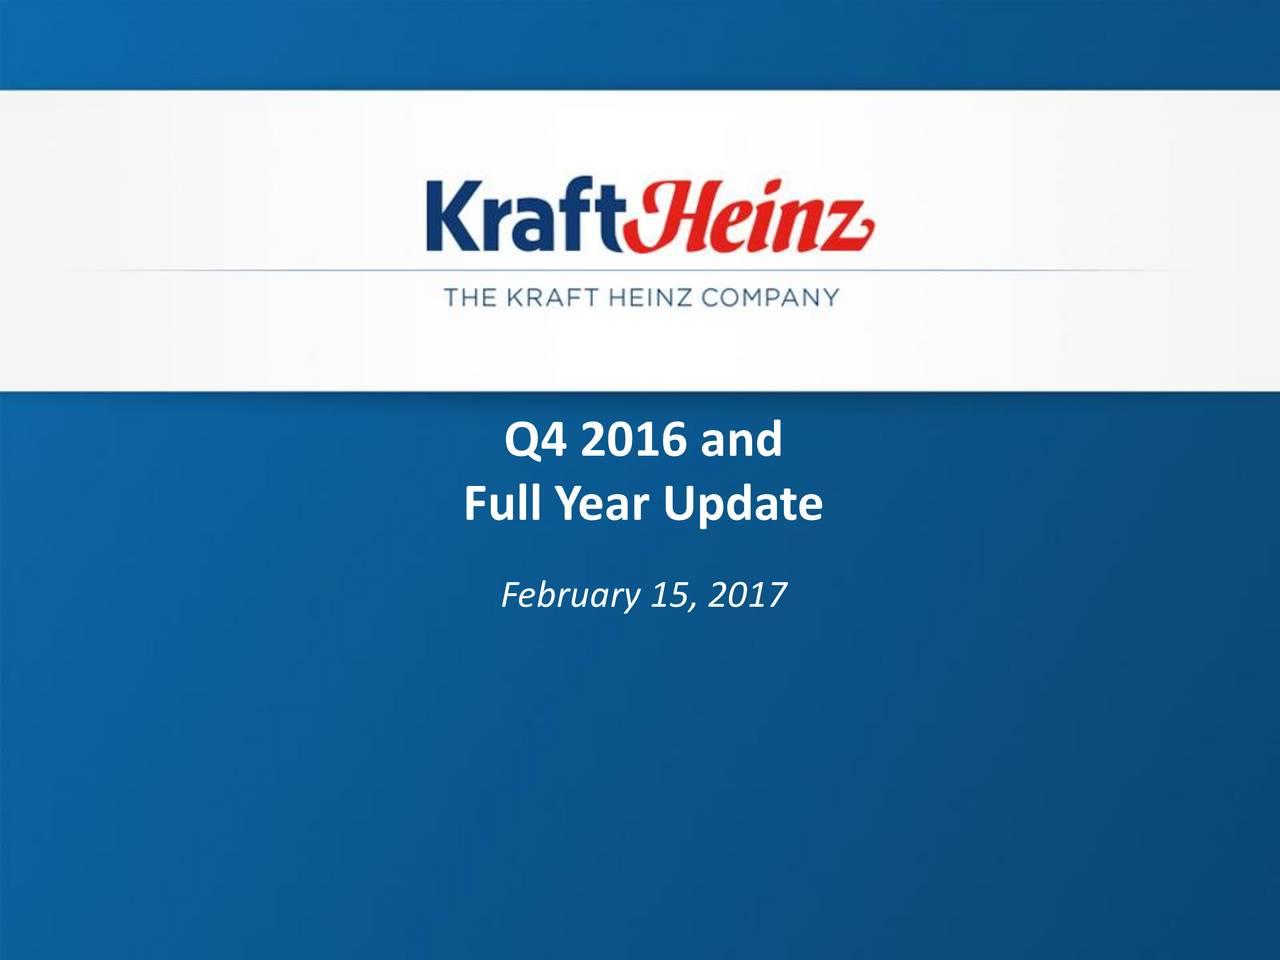 Full Year Update February 15, 2017